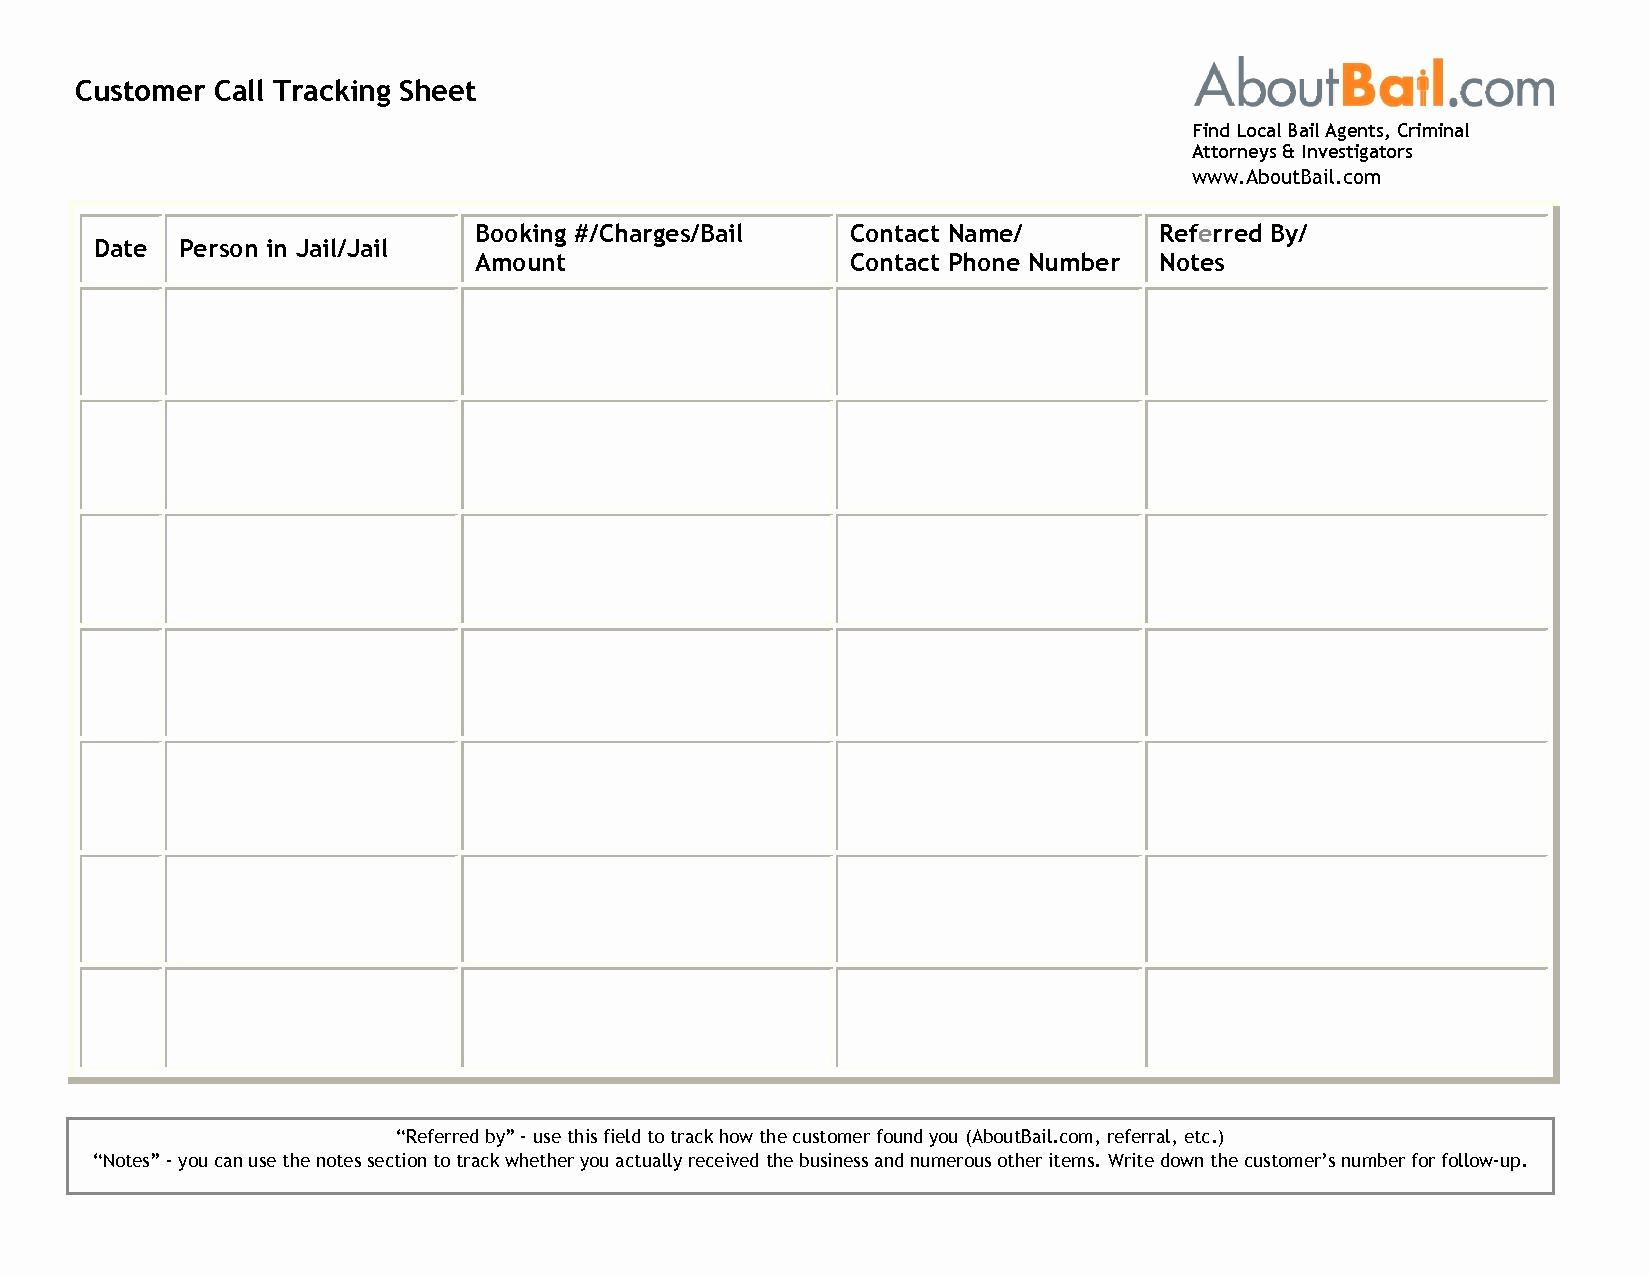 Tracking Sales Calls Spreadsheet Lovely Sales Calls Tracking With How To Create A Sales Tracking Spreadsheet